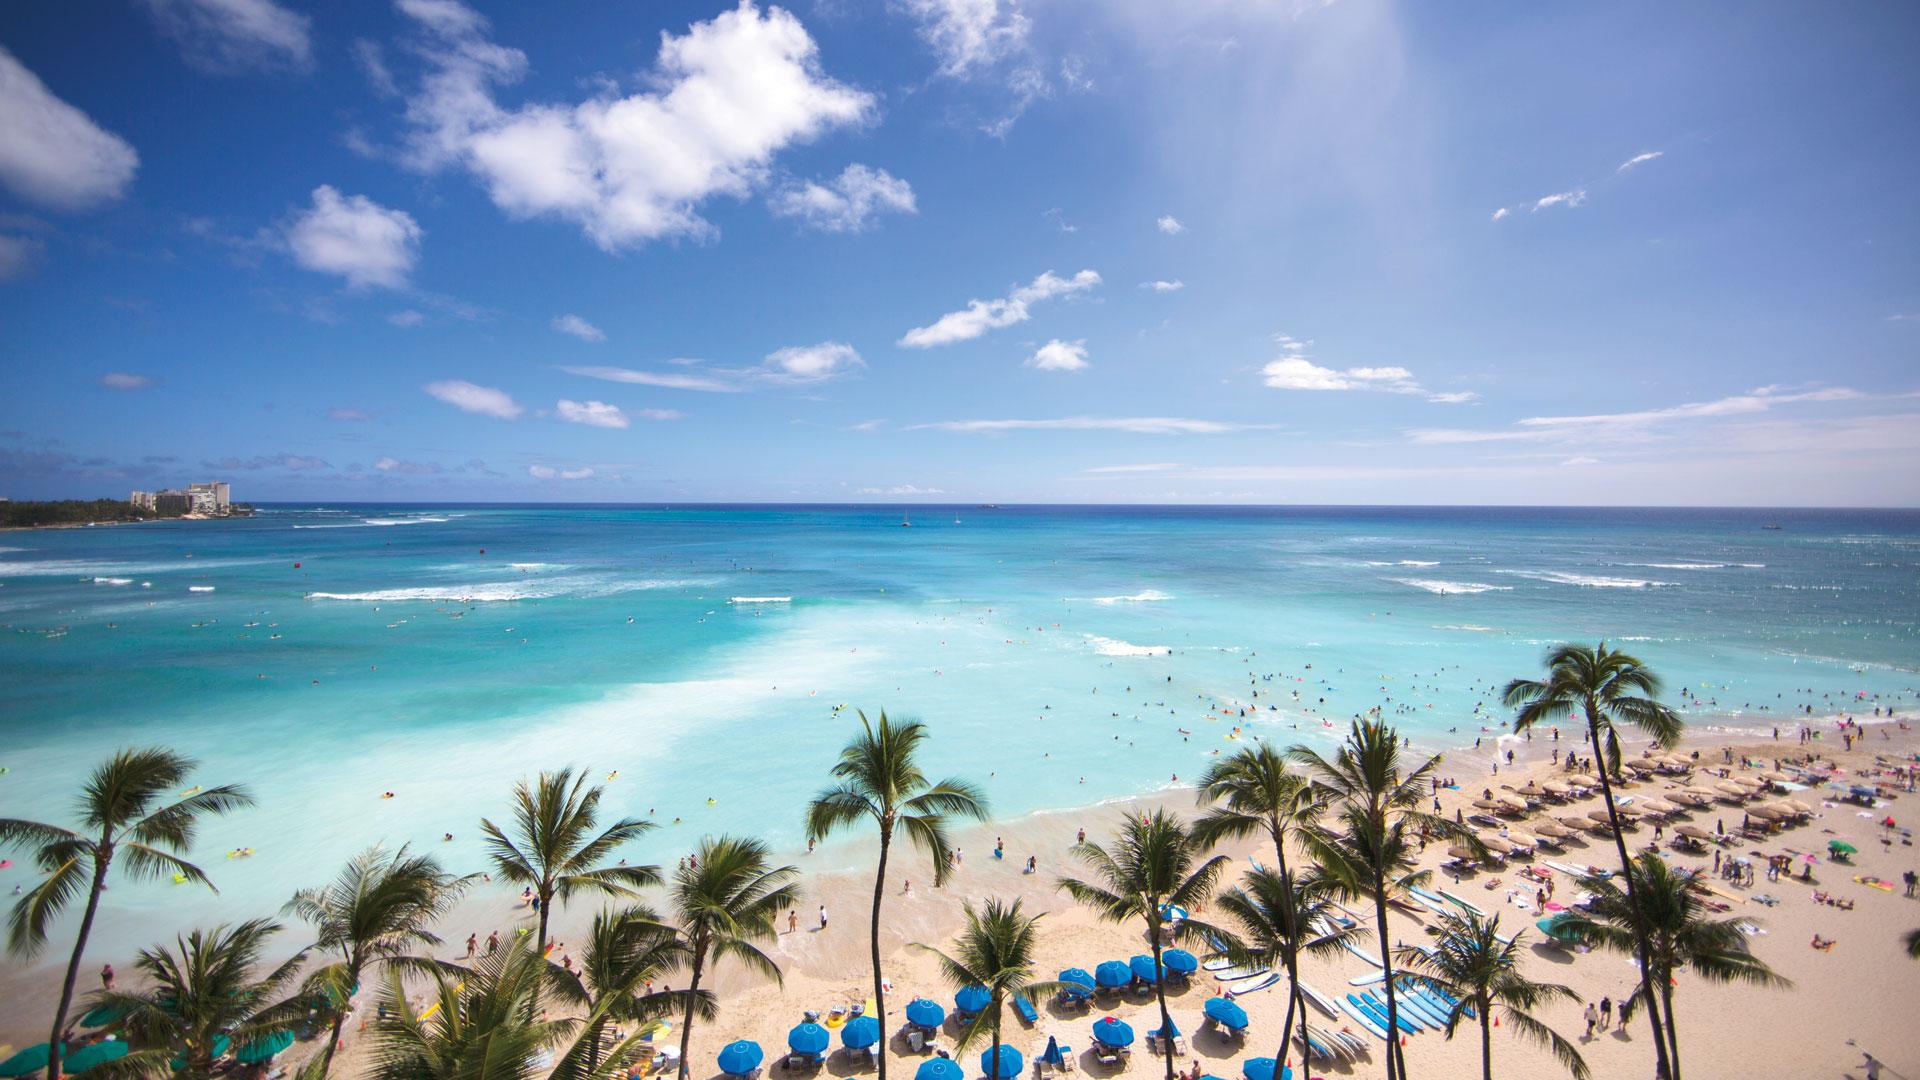 Res: 1920x1080, Waikiki Beach Wallpaper 12